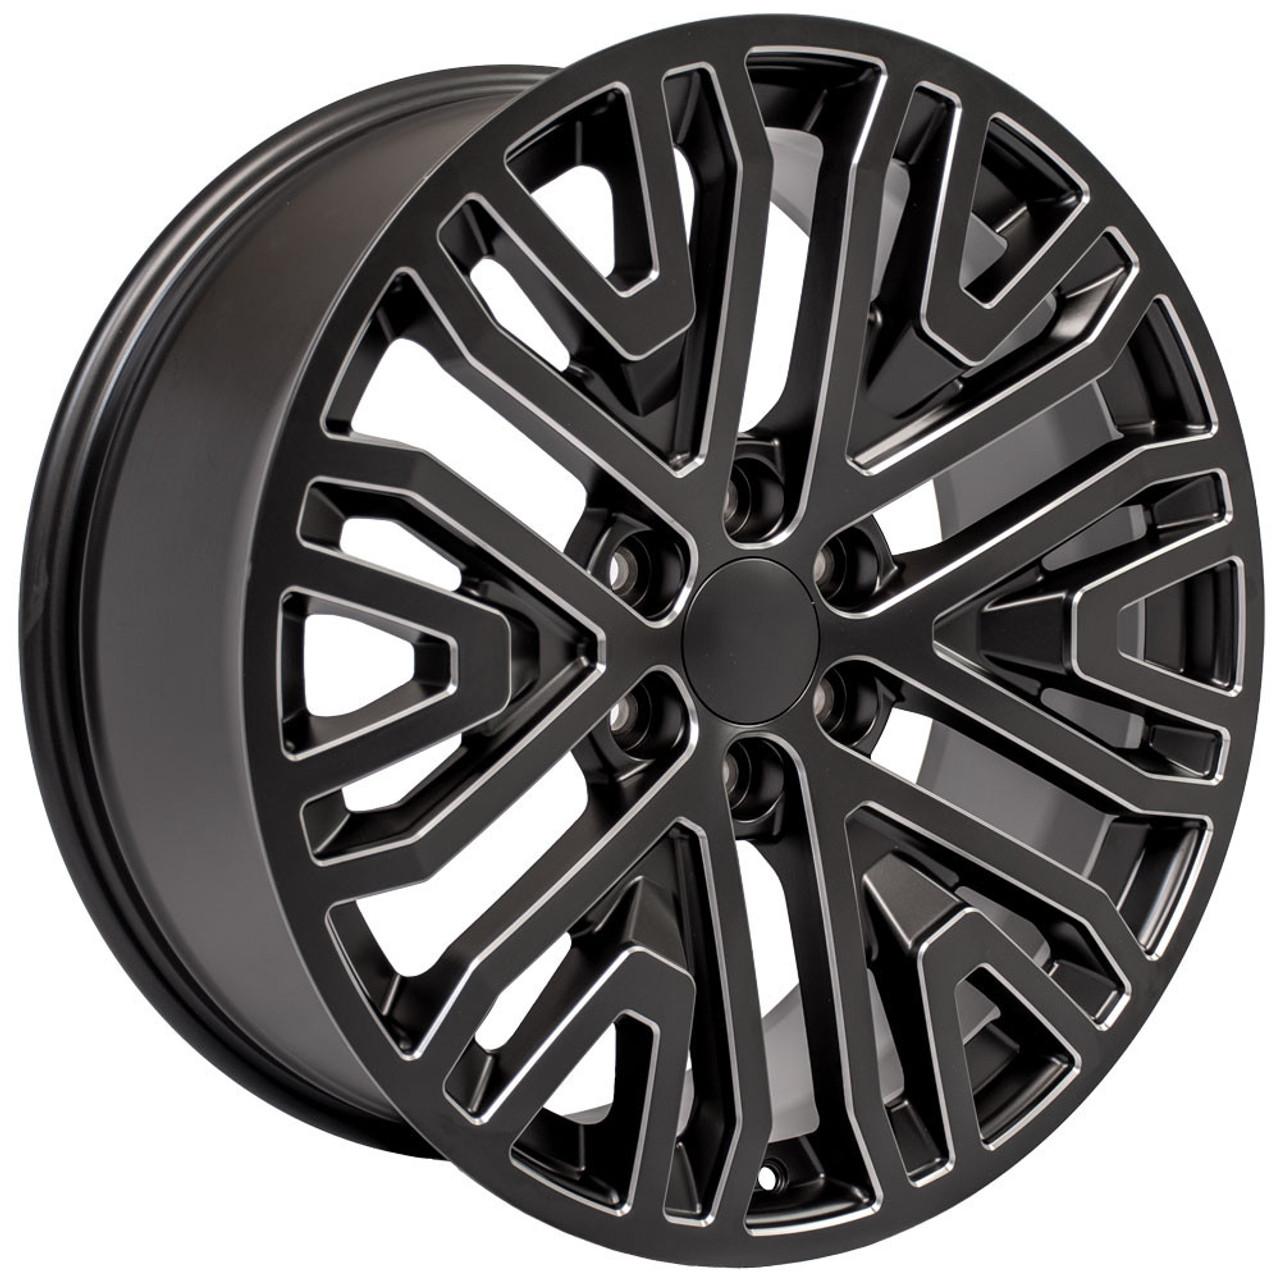 "Black with Milled Edge 22"" Six Split Spoke Wheels for Chevy Silverado, Tahoe, Suburban"